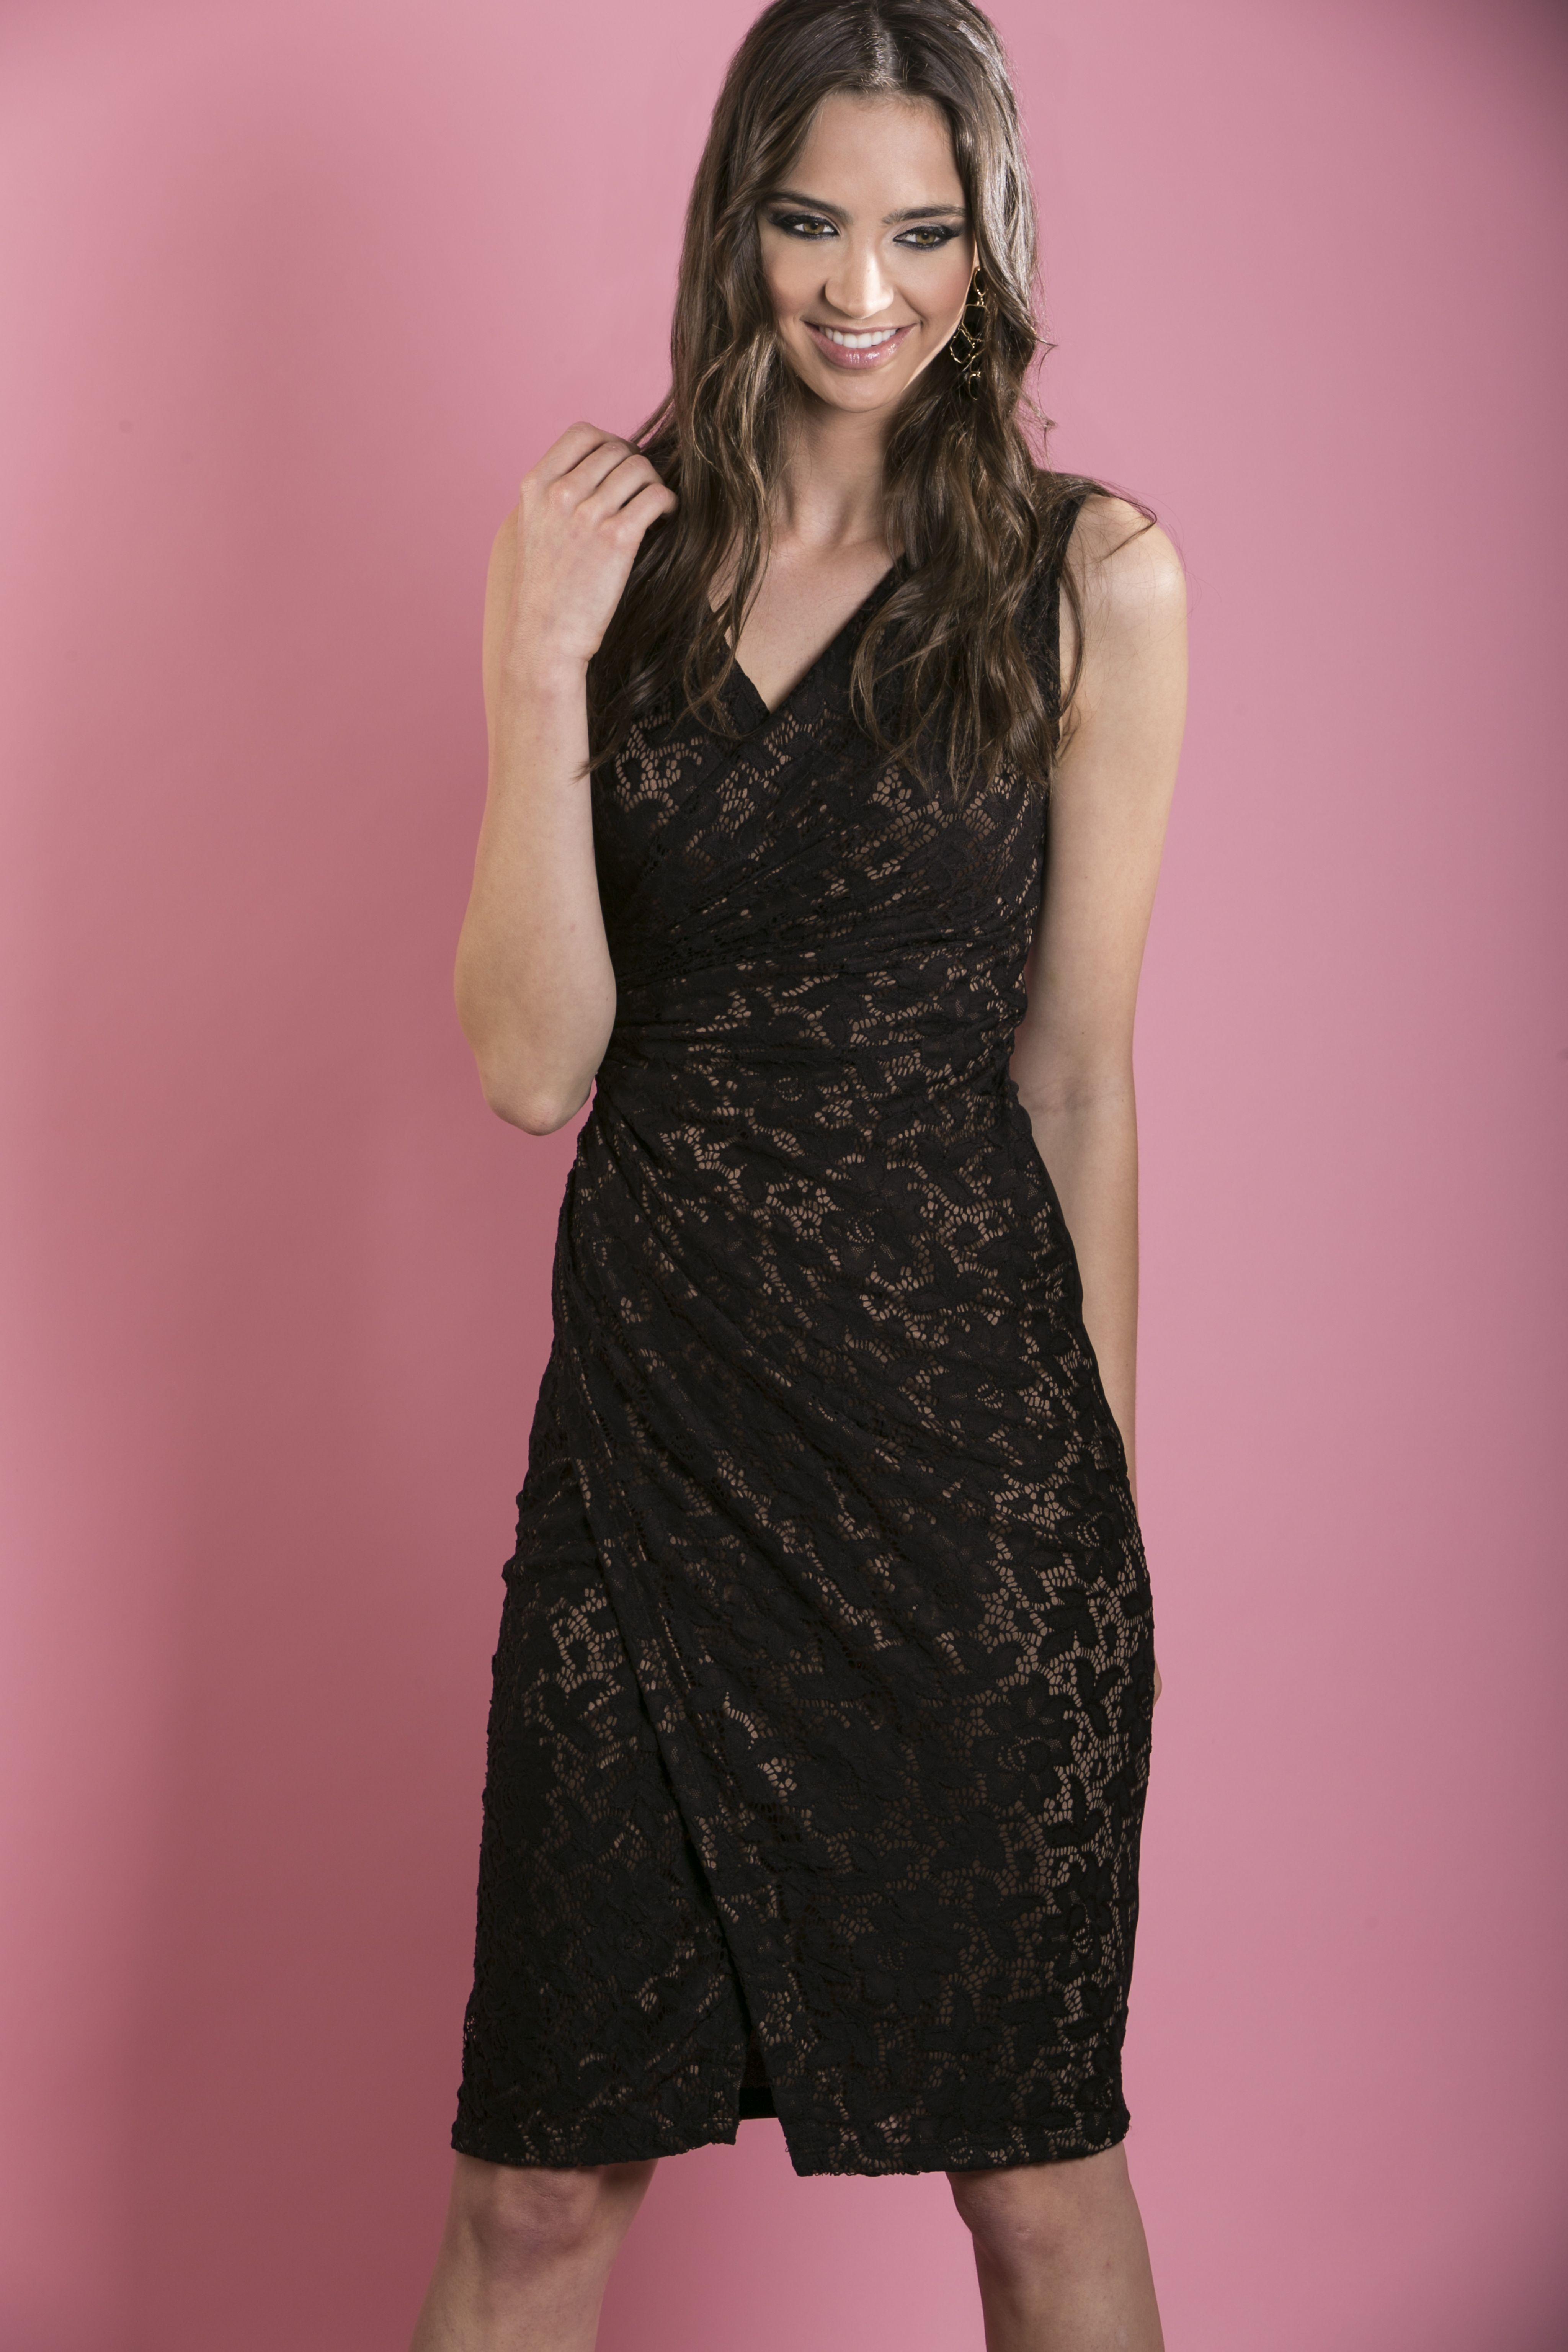 Vestido negro en encaje. | LAE OTOÑO-INVIERNO 2013 | Pinterest